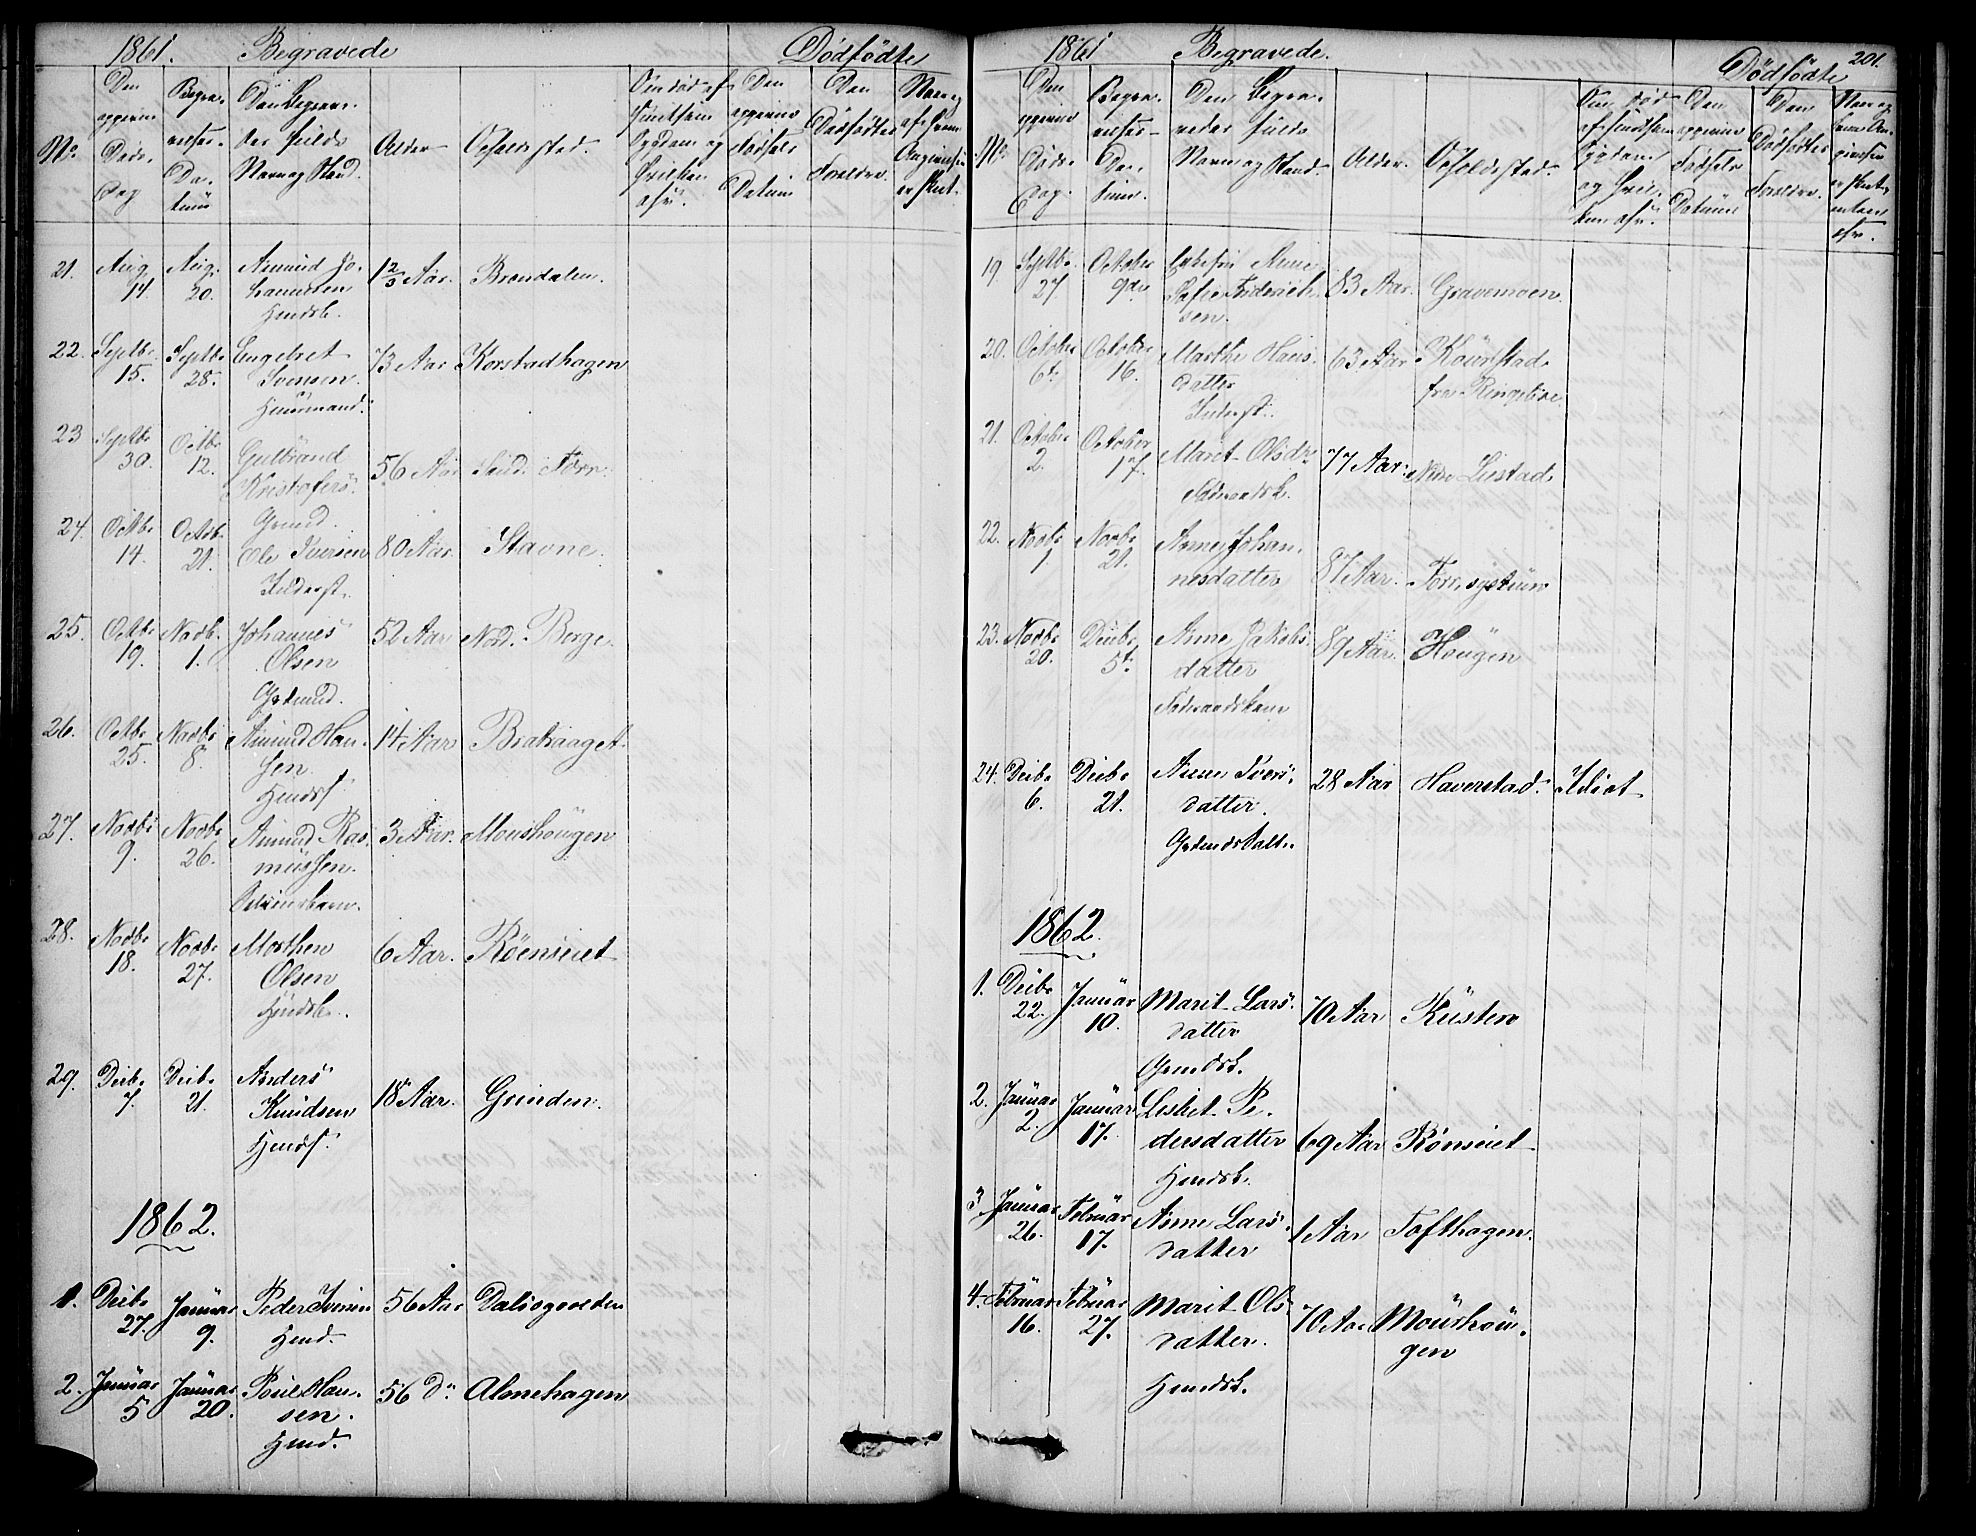 SAH, Sør-Fron prestekontor, H/Ha/Hab/L0001: Klokkerbok nr. 1, 1844-1863, s. 201